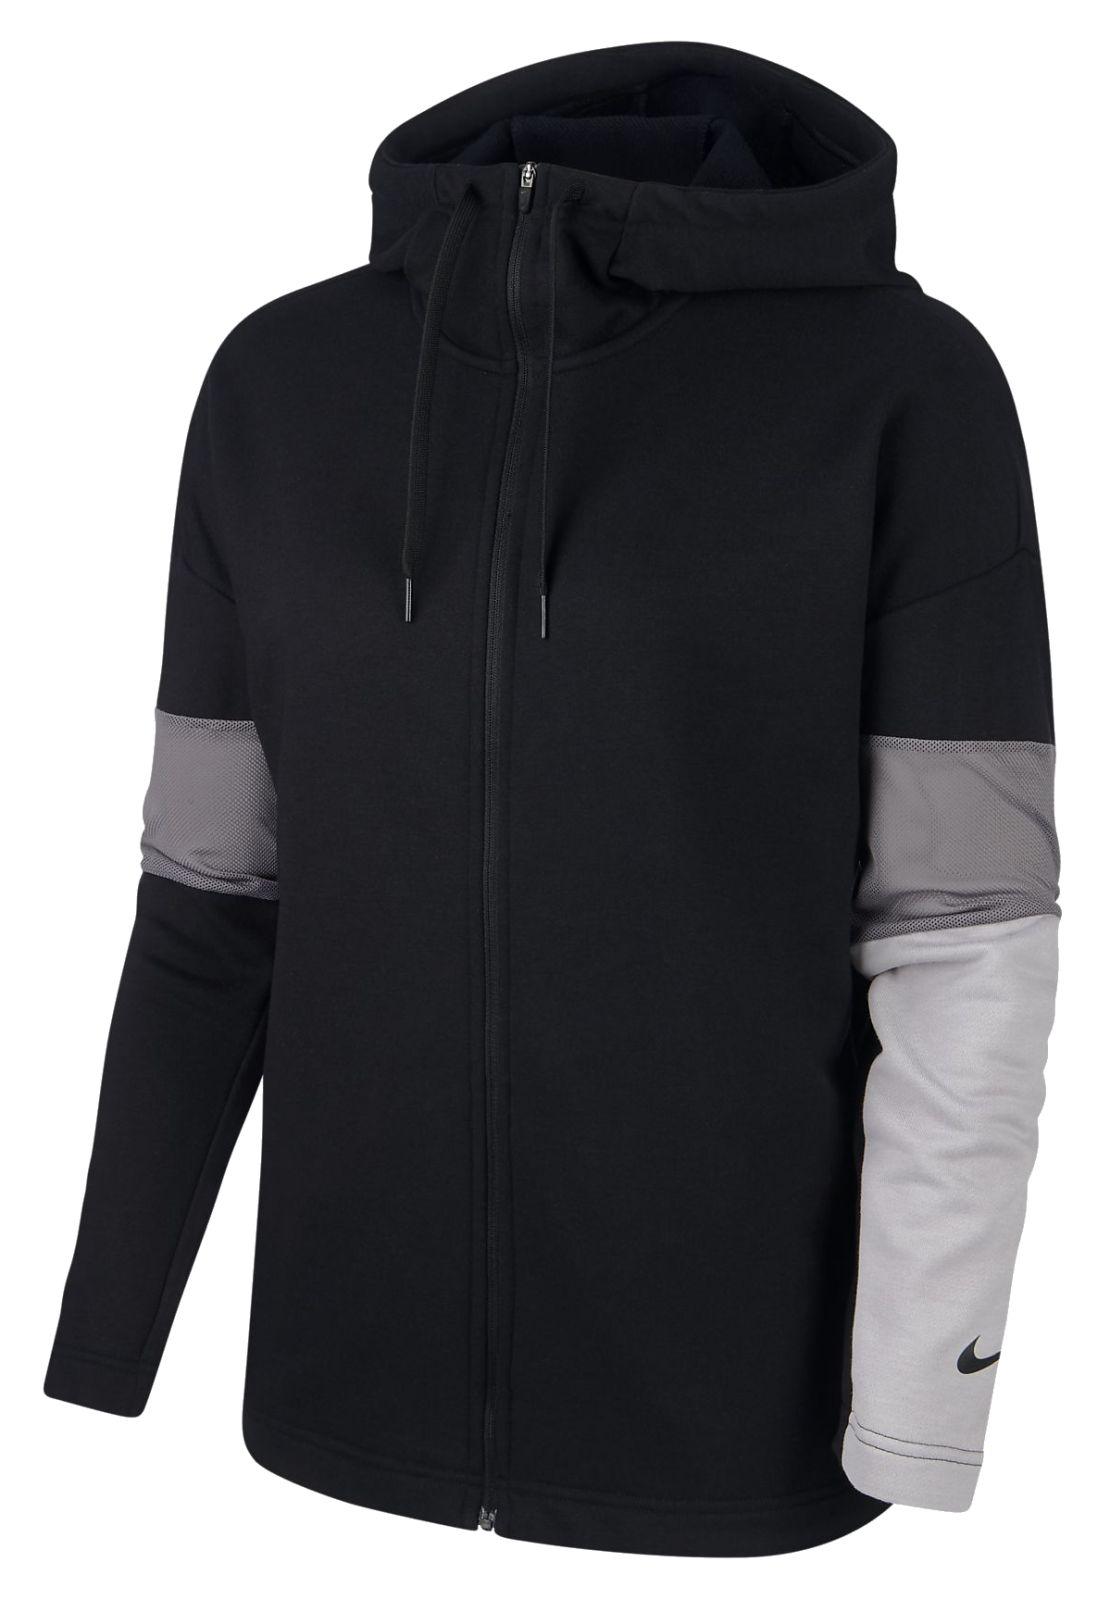 nike sweatshirt jacke damen grau modische jacken 2018 2019. Black Bedroom Furniture Sets. Home Design Ideas